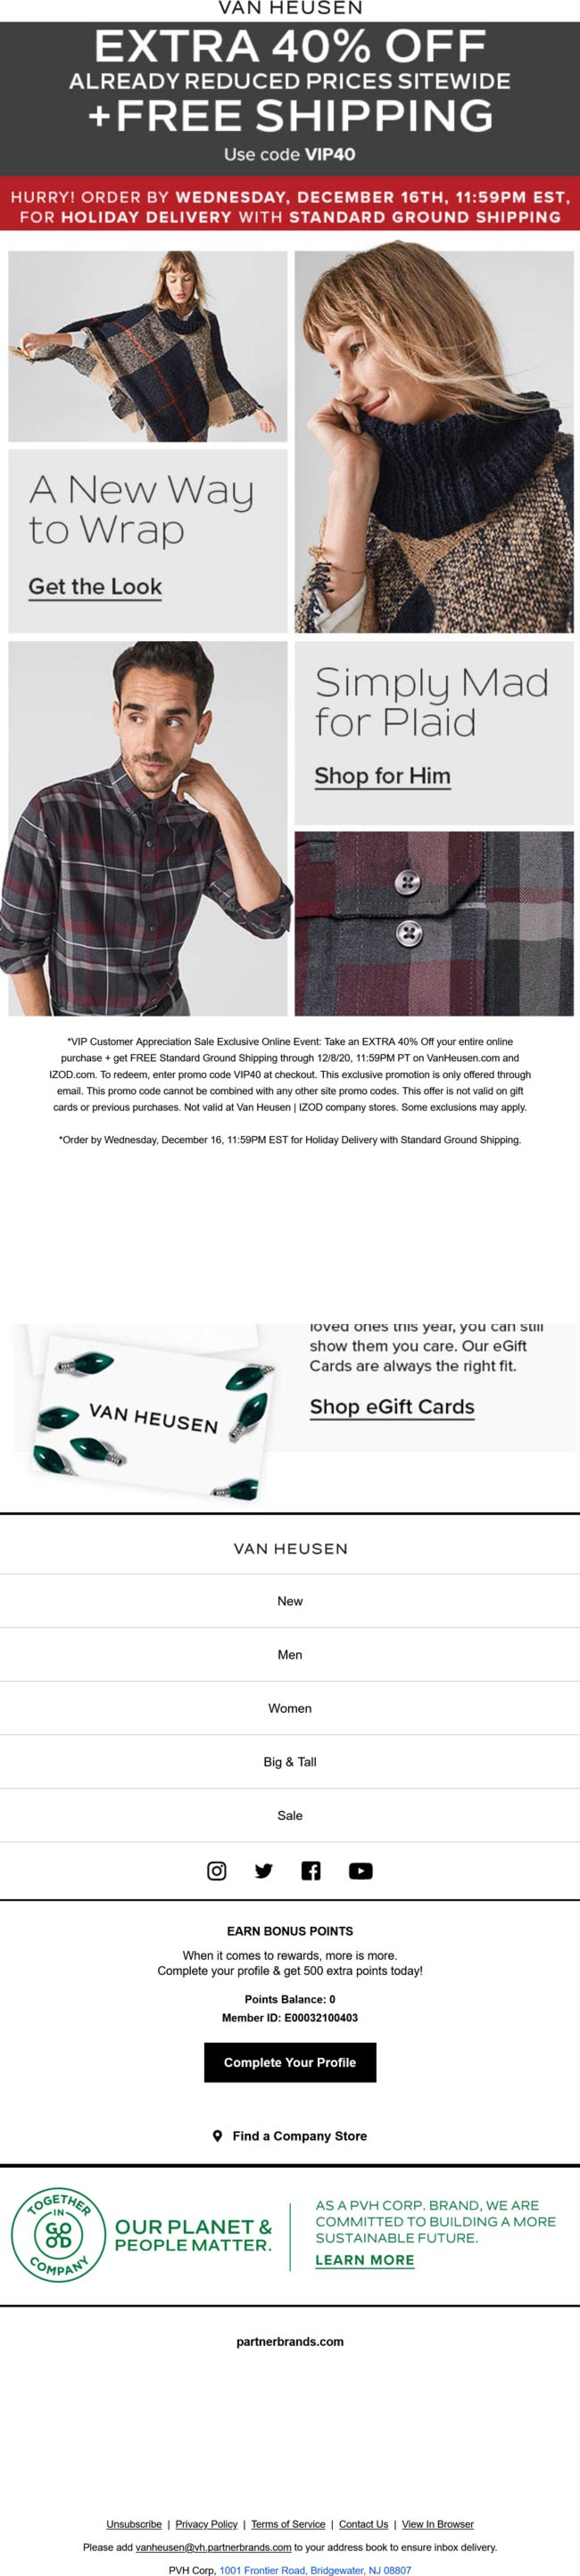 Van Heusen stores Coupon  Extra 40% off everything at Van Heusen via promo code VIP40 #vanheusen